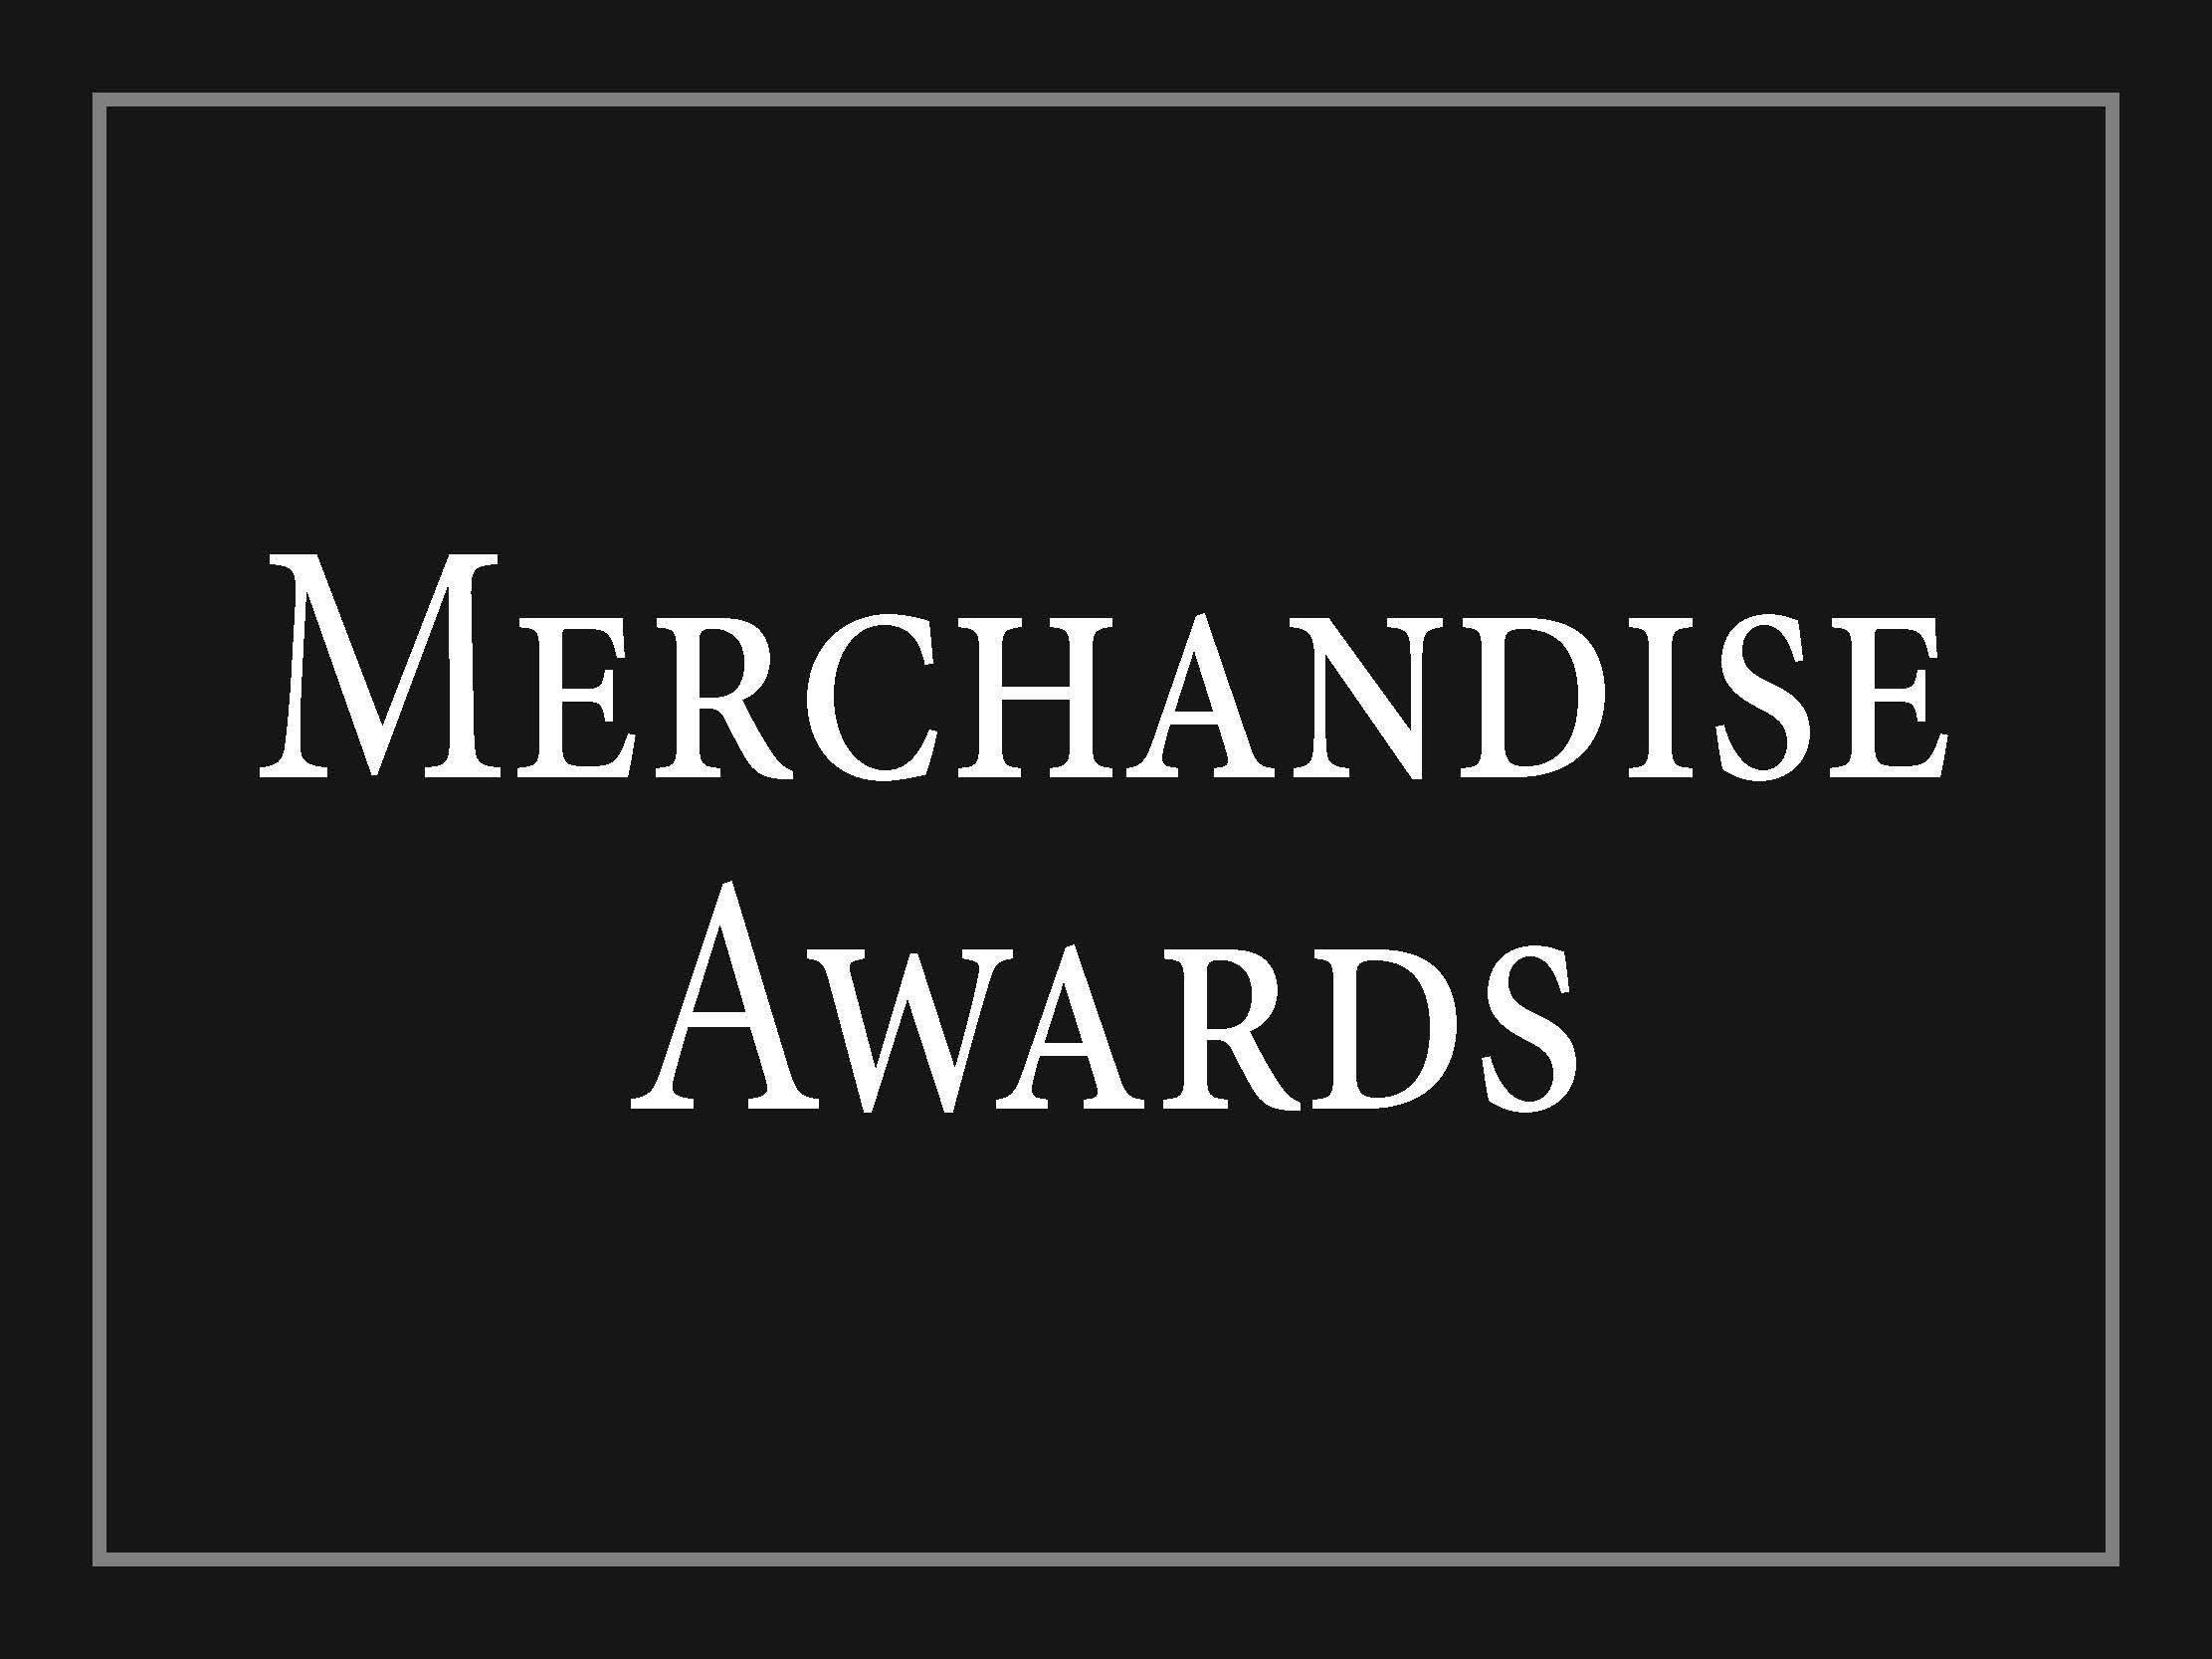 Merchandise Awards